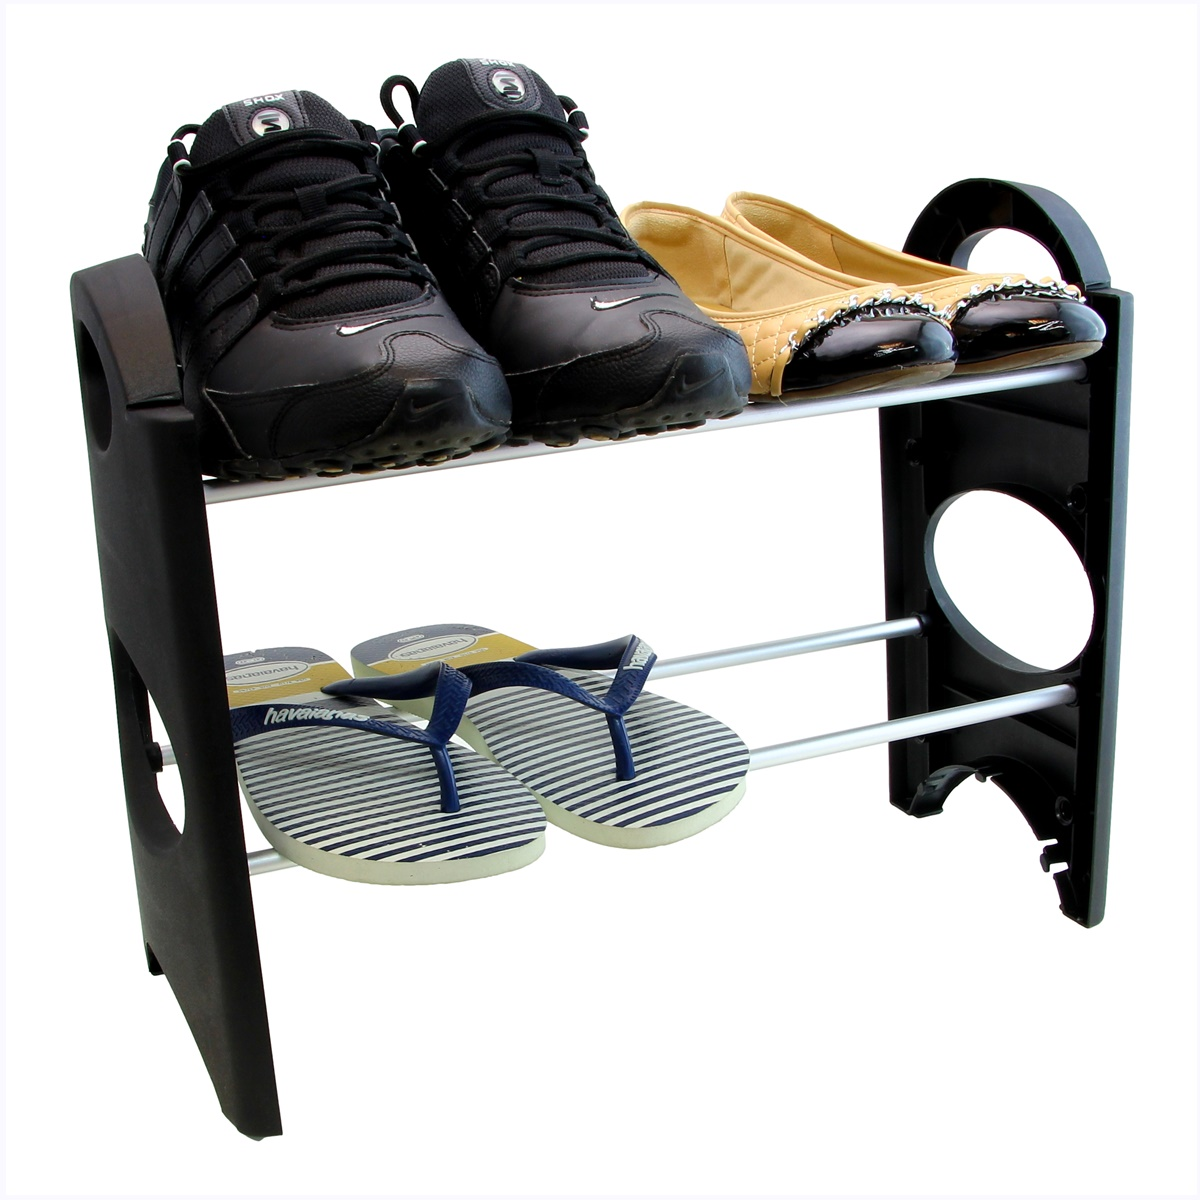 Sapateira Pequena Para Hall De Entrada Porta varias cores 8 Sapatos SAP-2A-4P-R